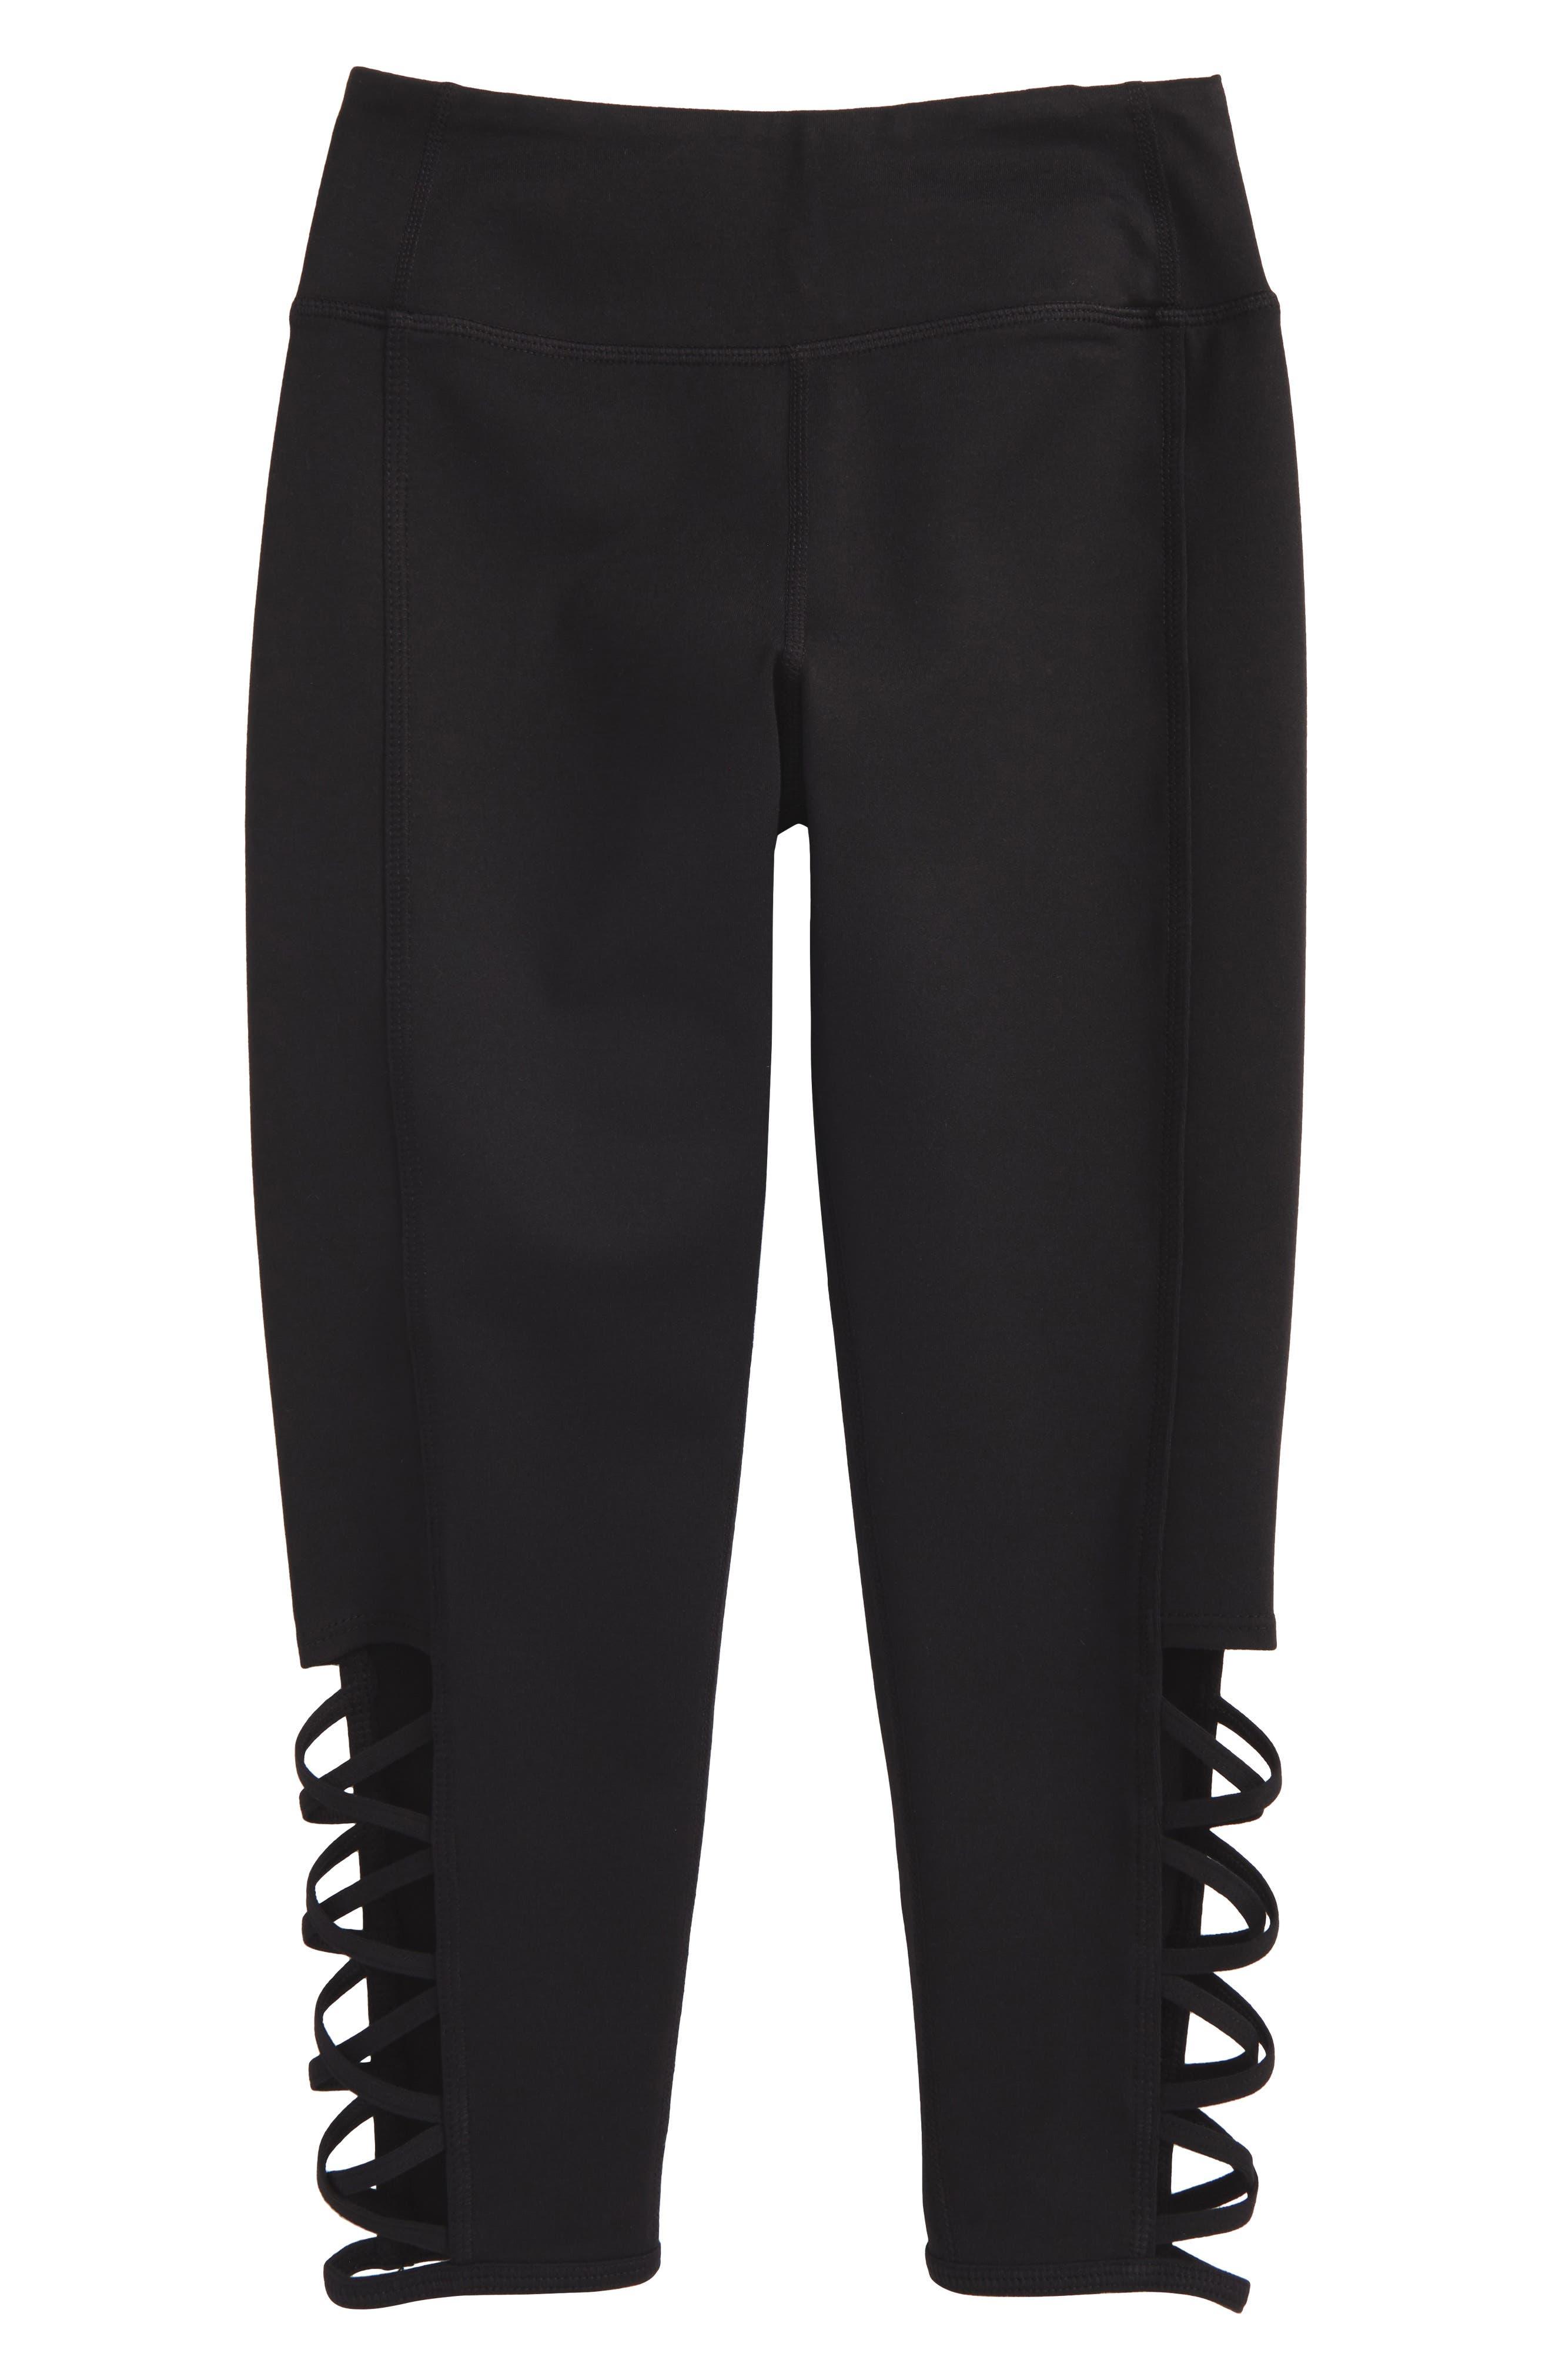 Strappy High Waist Leggings,                         Main,                         color, Black